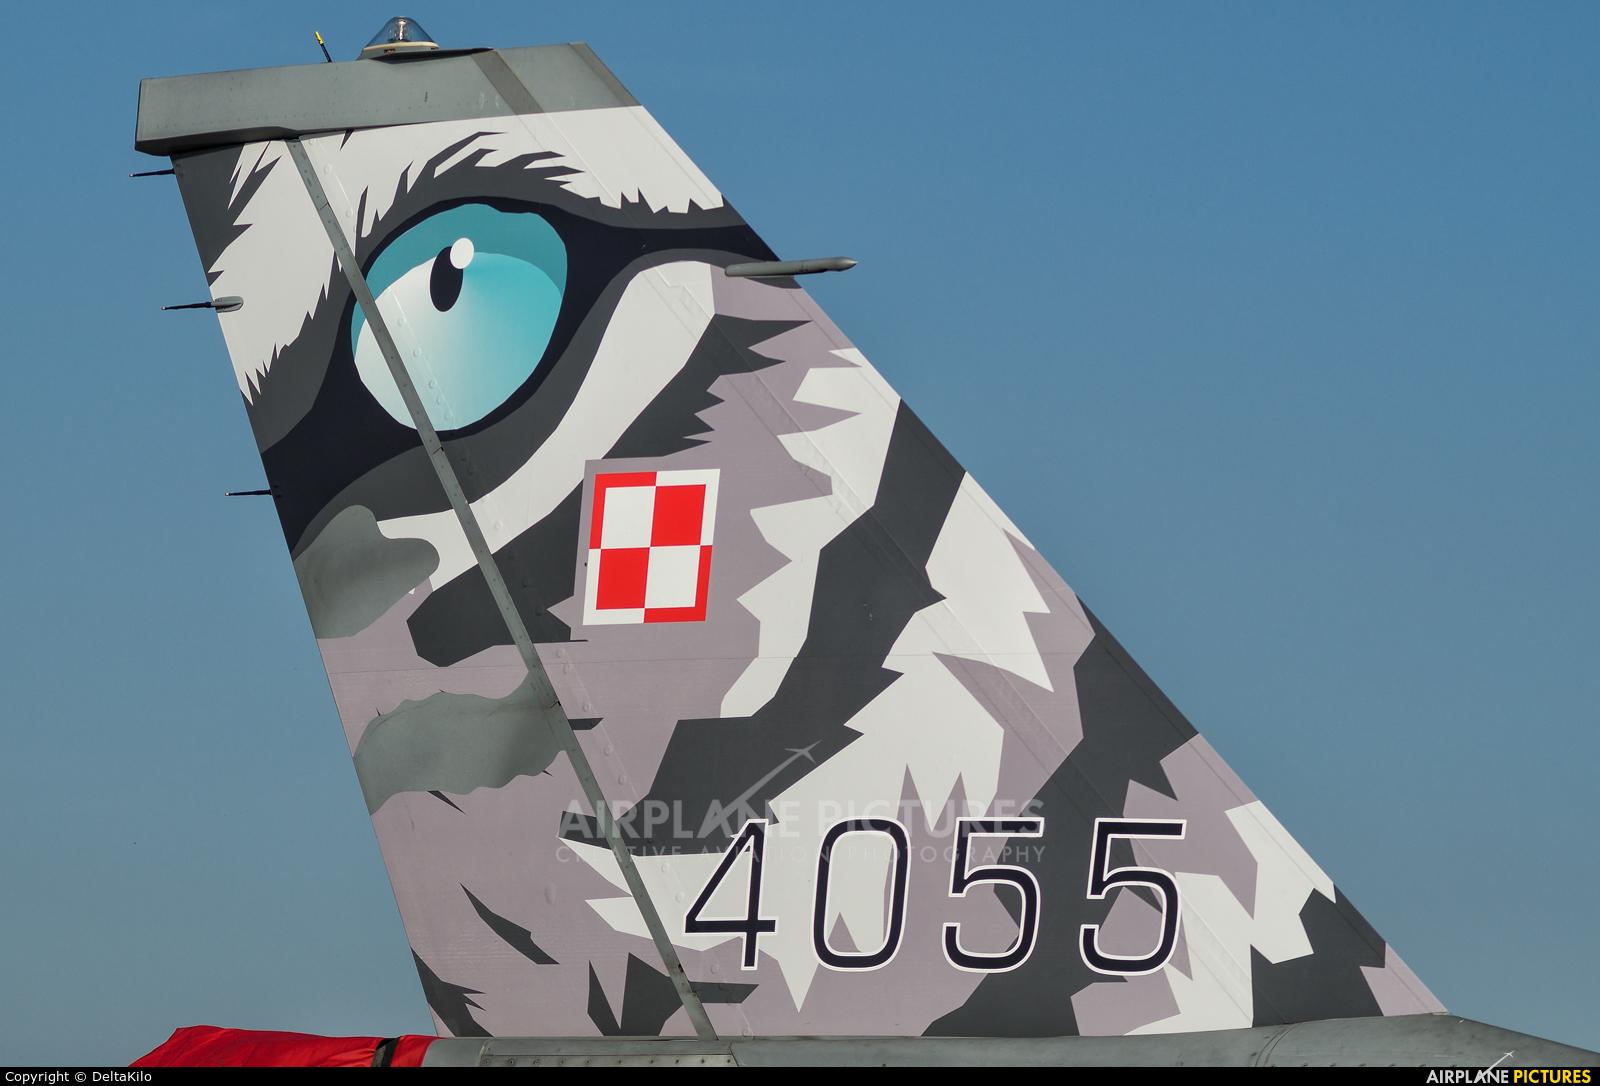 Poland - Air Force 4055 aircraft at Poznań - Krzesiny